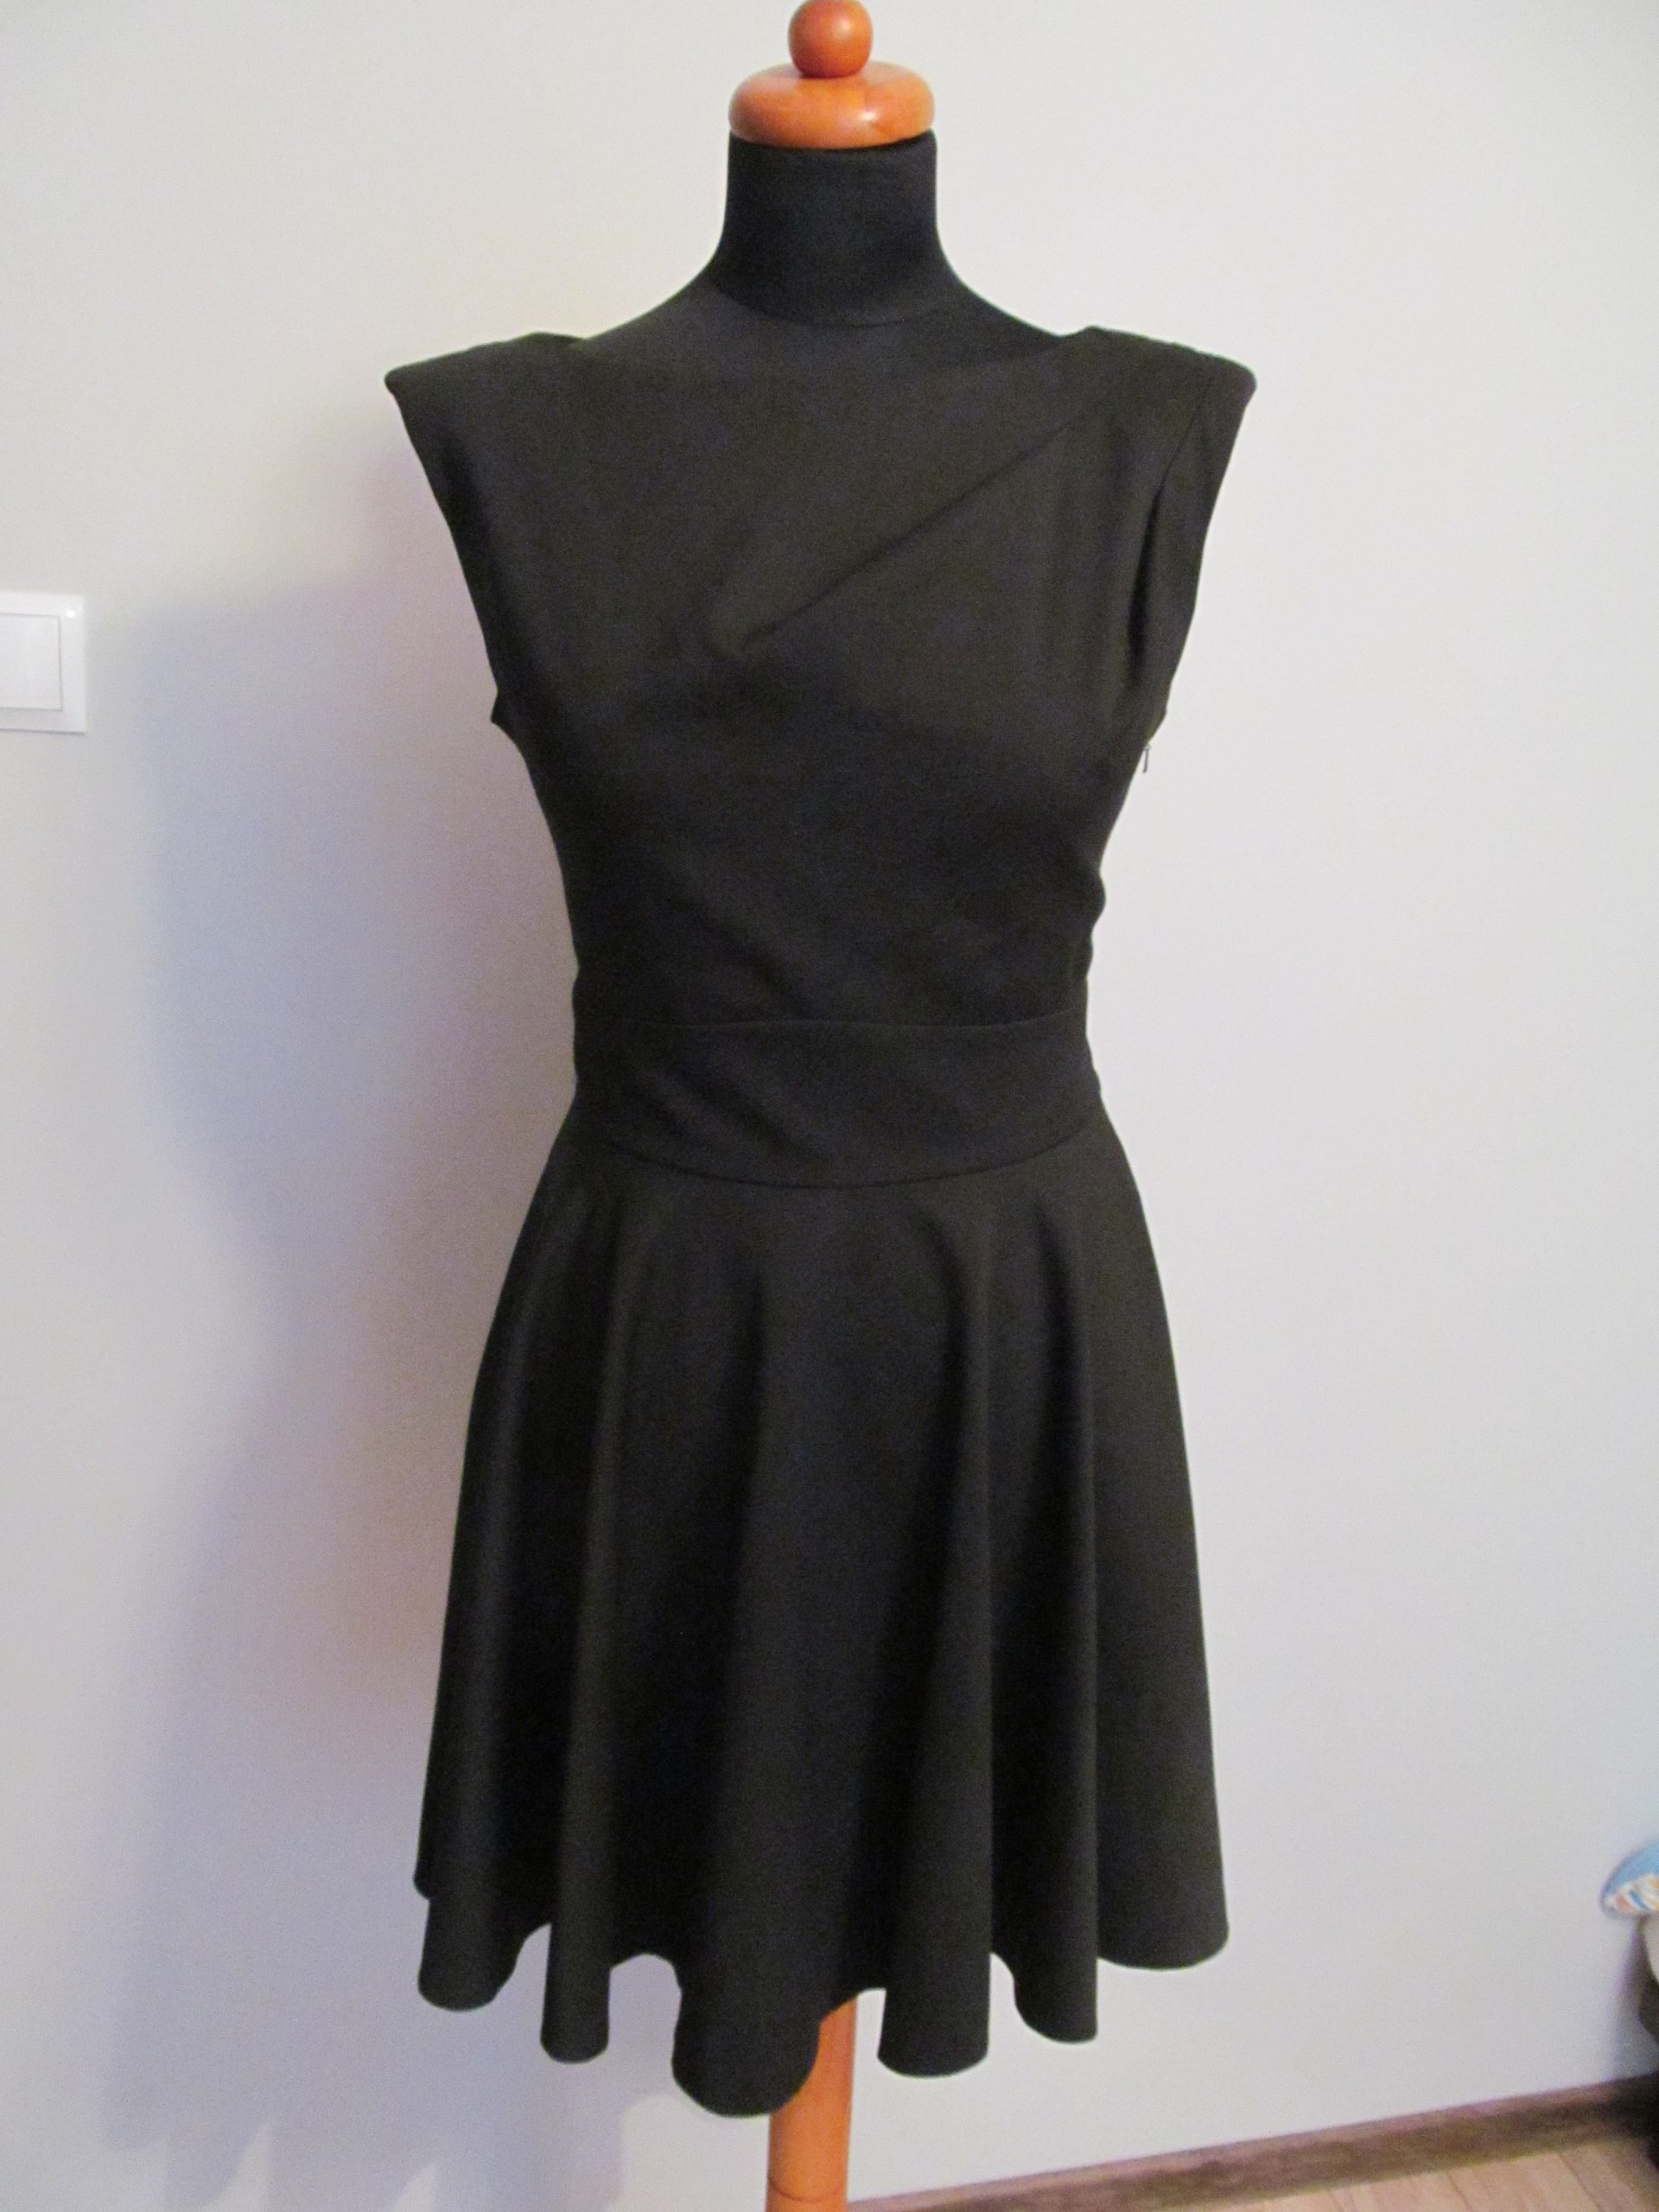 26e7060cc6 Piękna sukienka czarna ASOS rozkloszowana 38 40 - 7274025263 ...